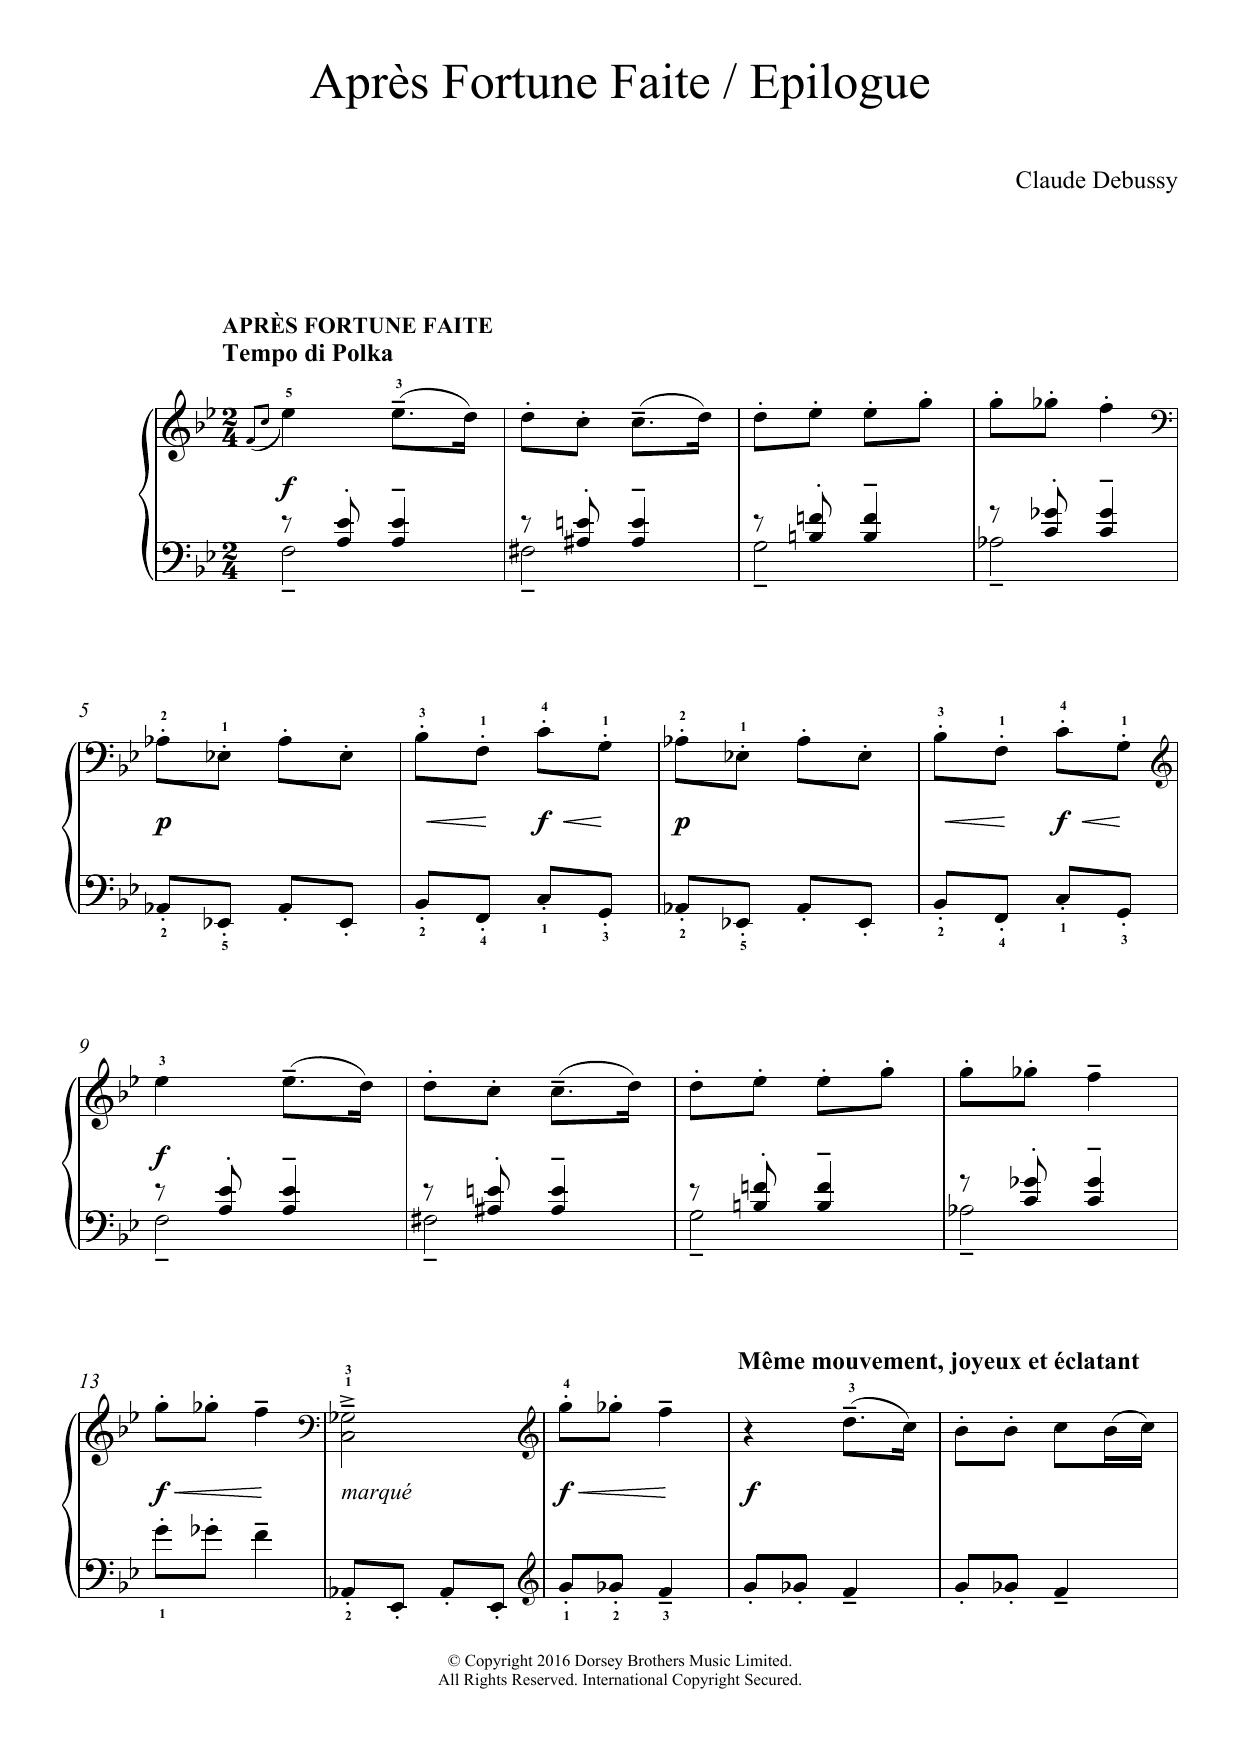 Apres Fortune Faite/ Epilogue Sheet Music